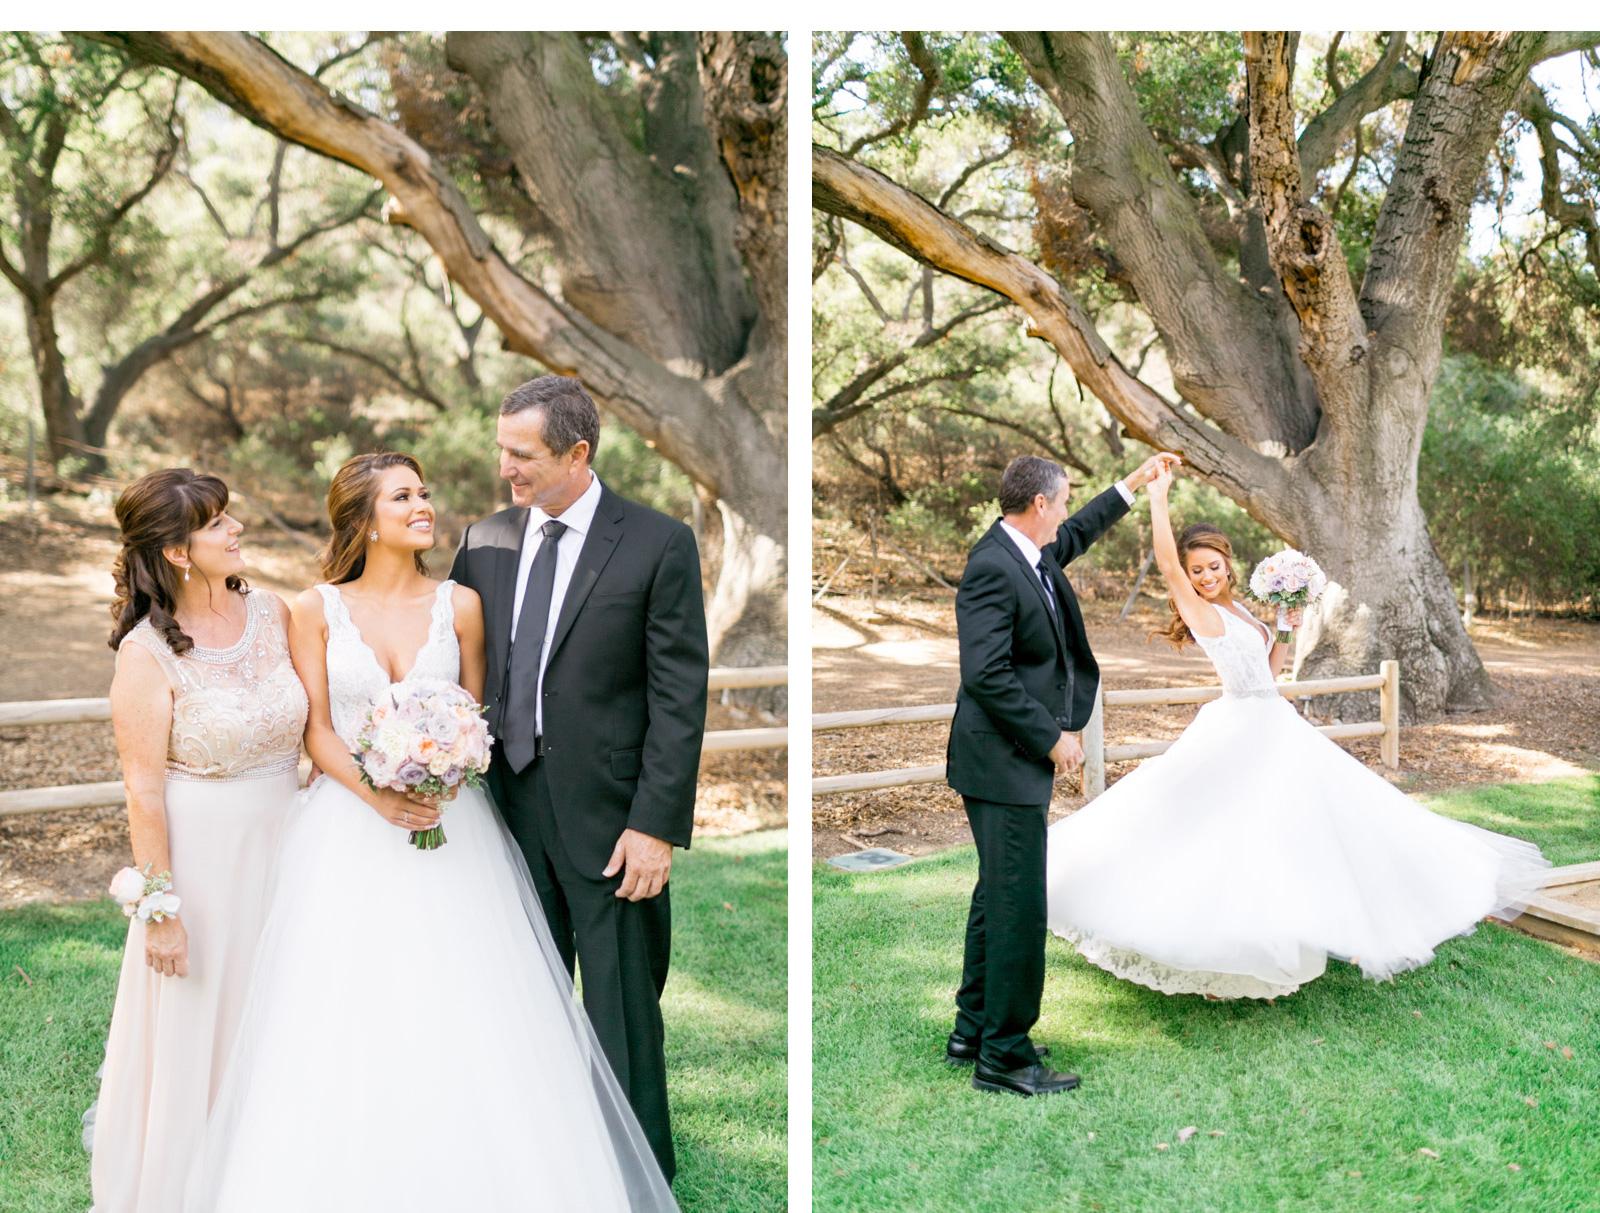 Nia-Sanchez-Southern-California-Wedding-Natalie-Schutt-Photography_05.jpg